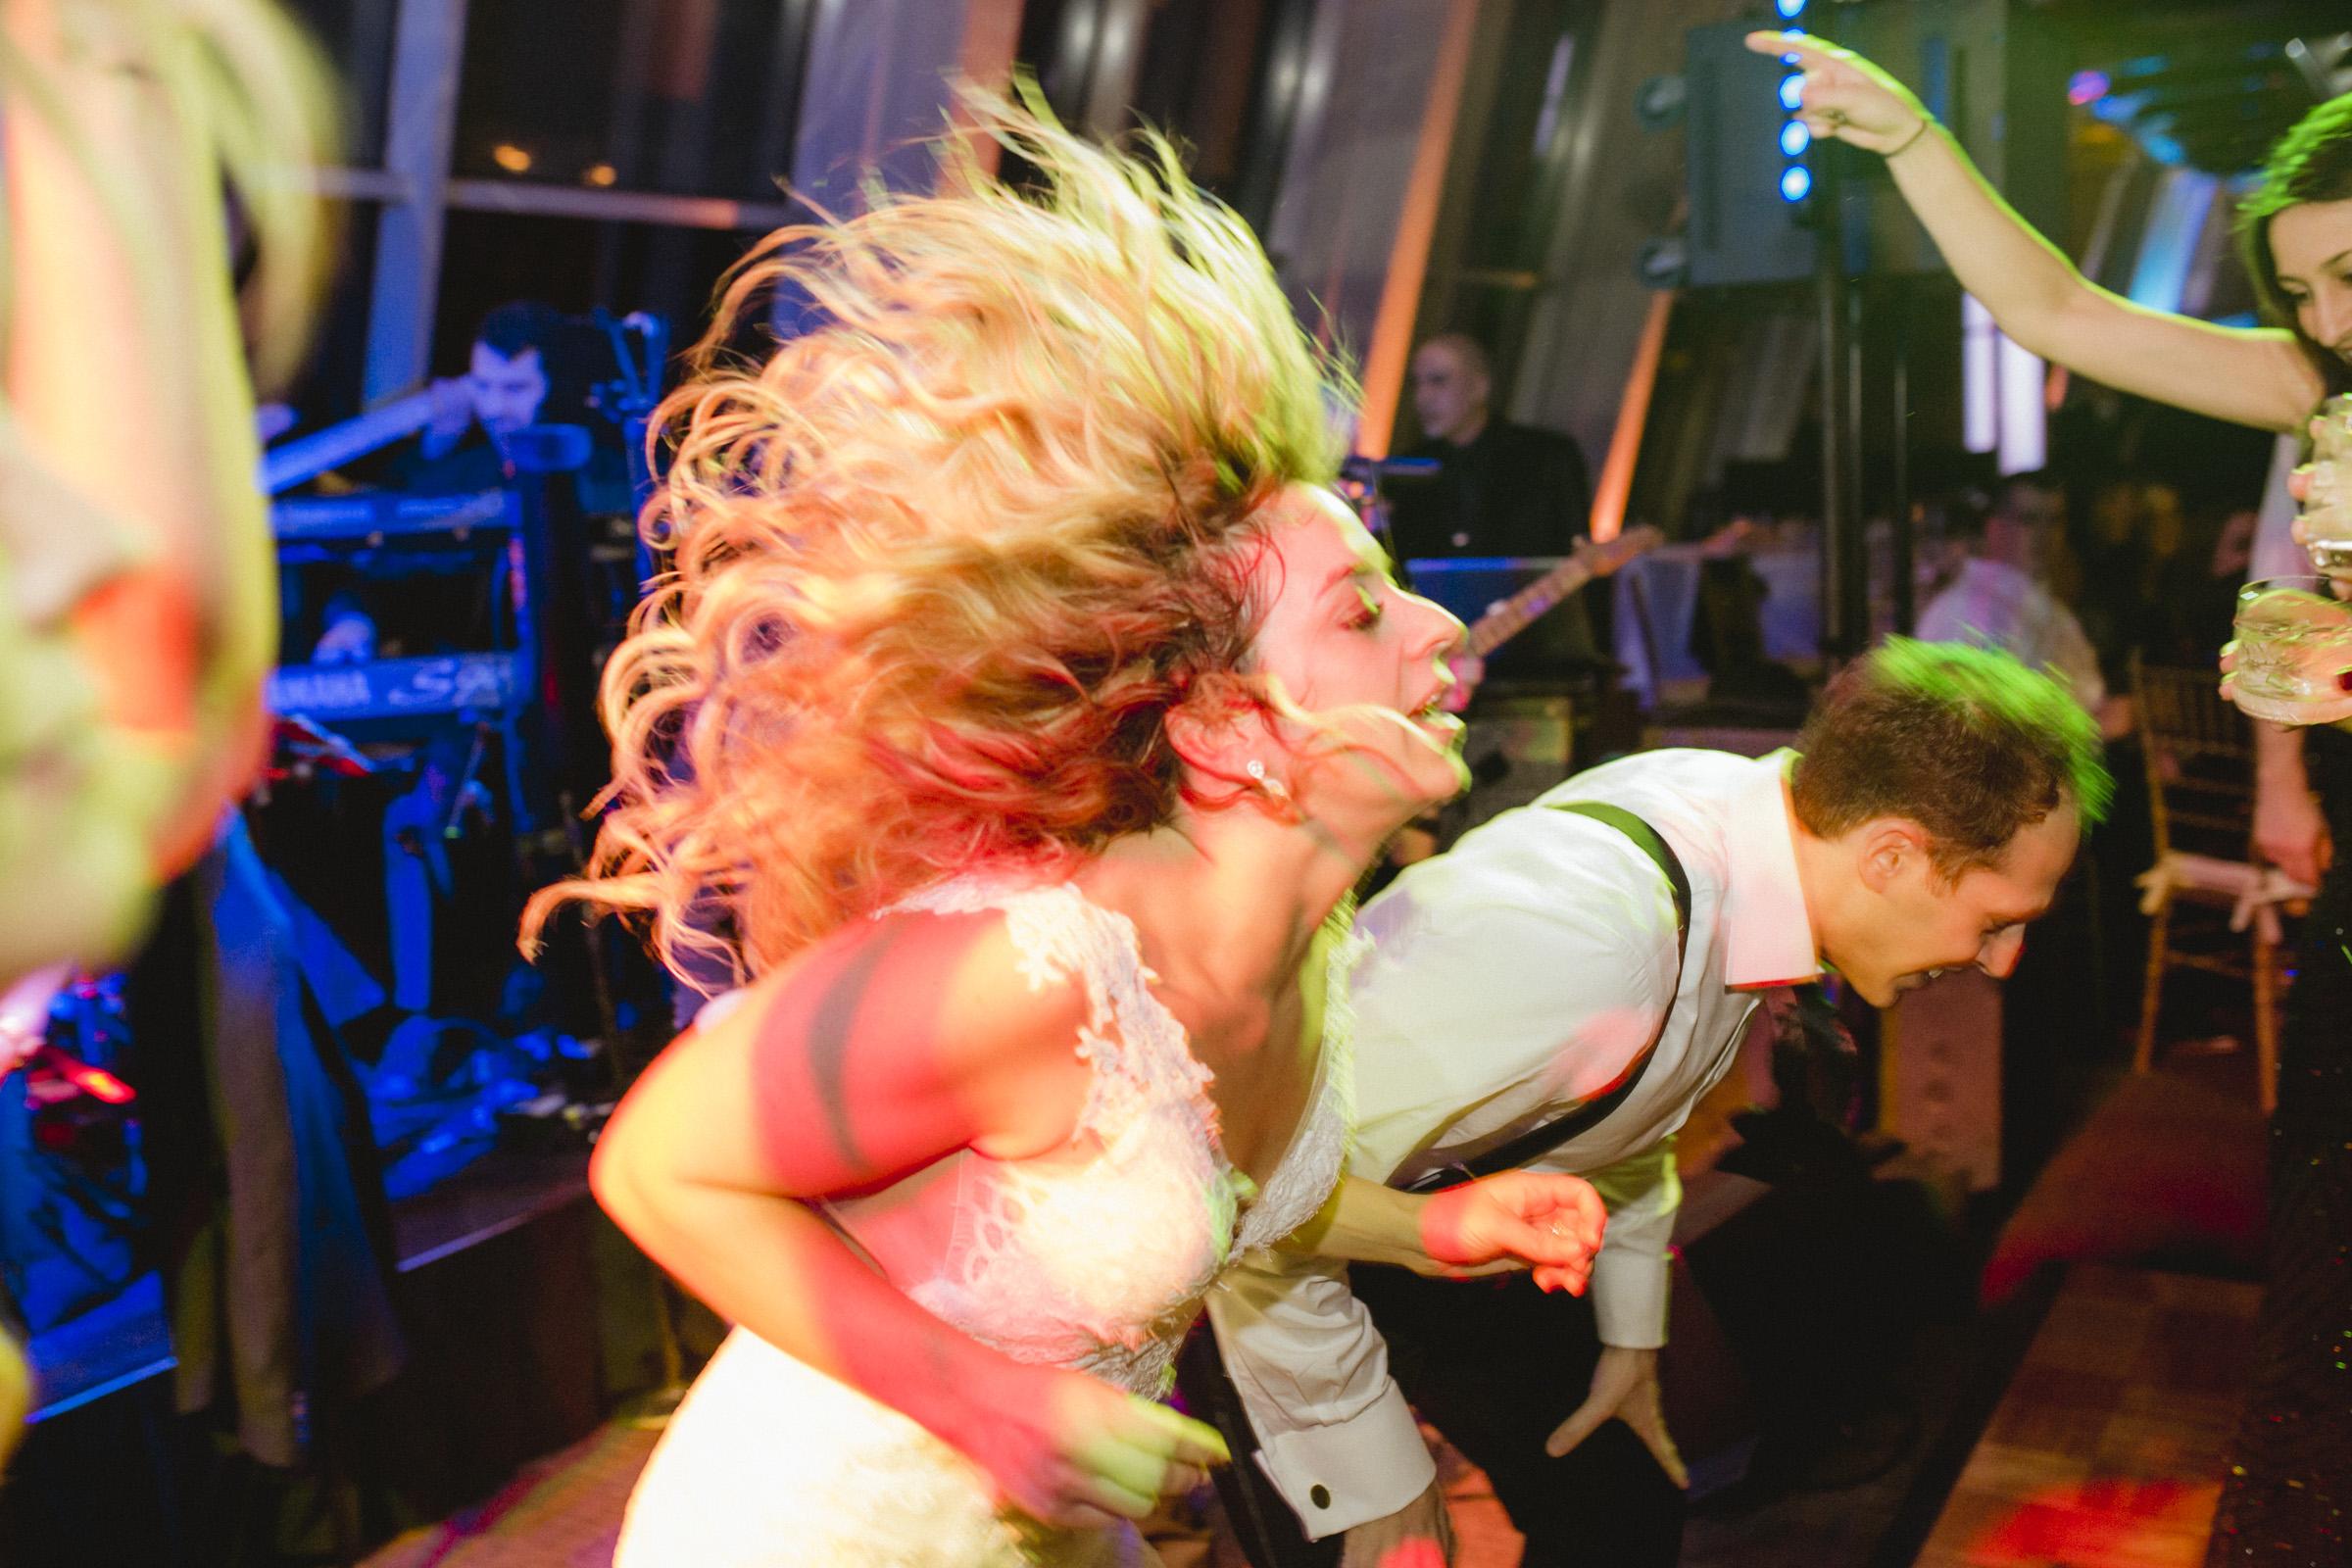 Amy Sims Photography | Bride's hair is wild while bride and groom headbang on the dance floor | NYU wedding | New York Wedding photographer | Manhattan wedding photographer